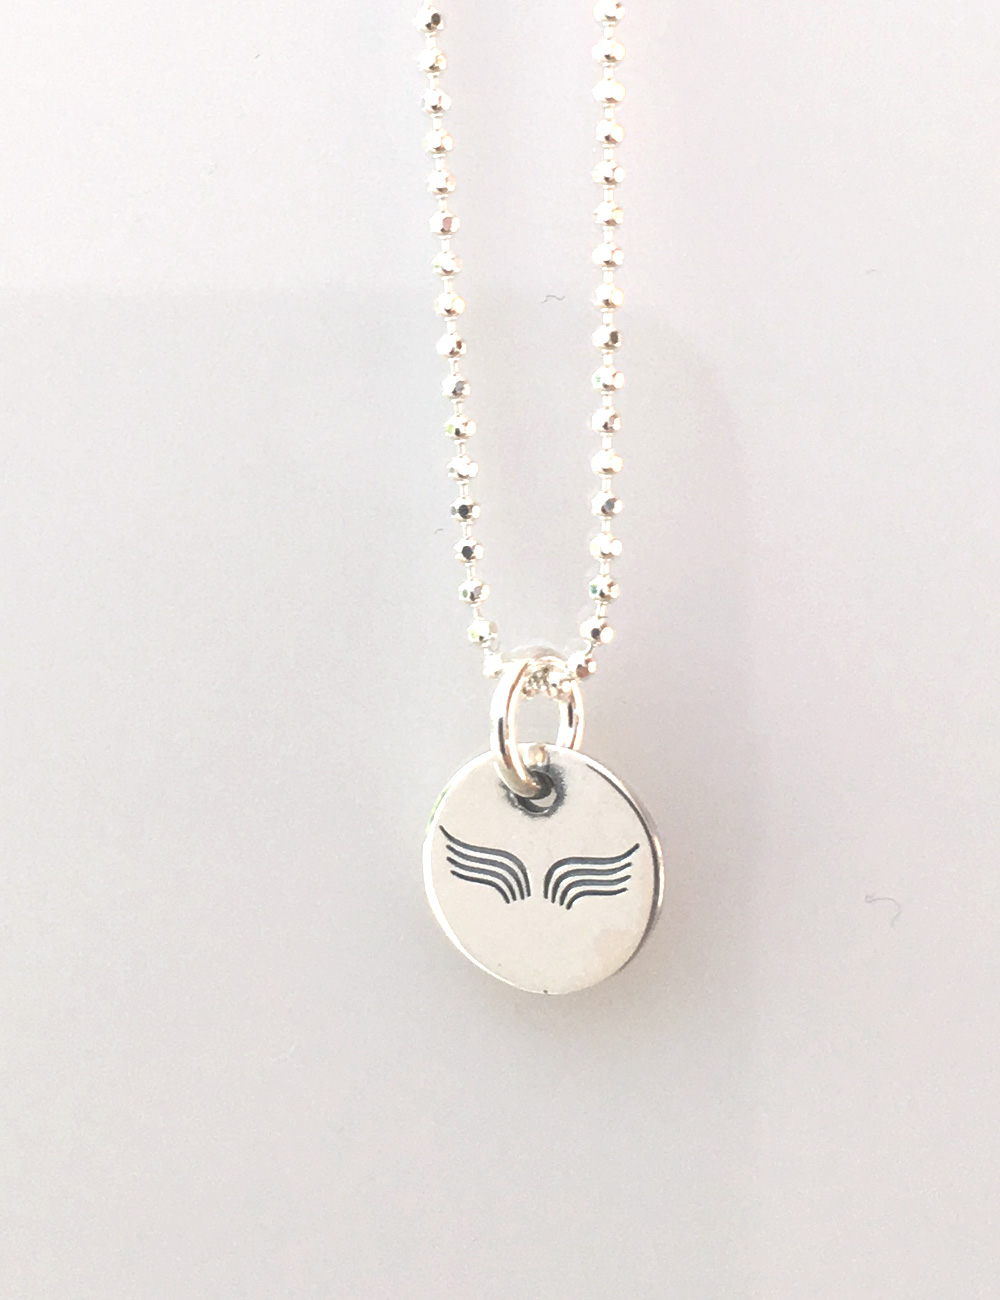 117 collier mini medaille web2